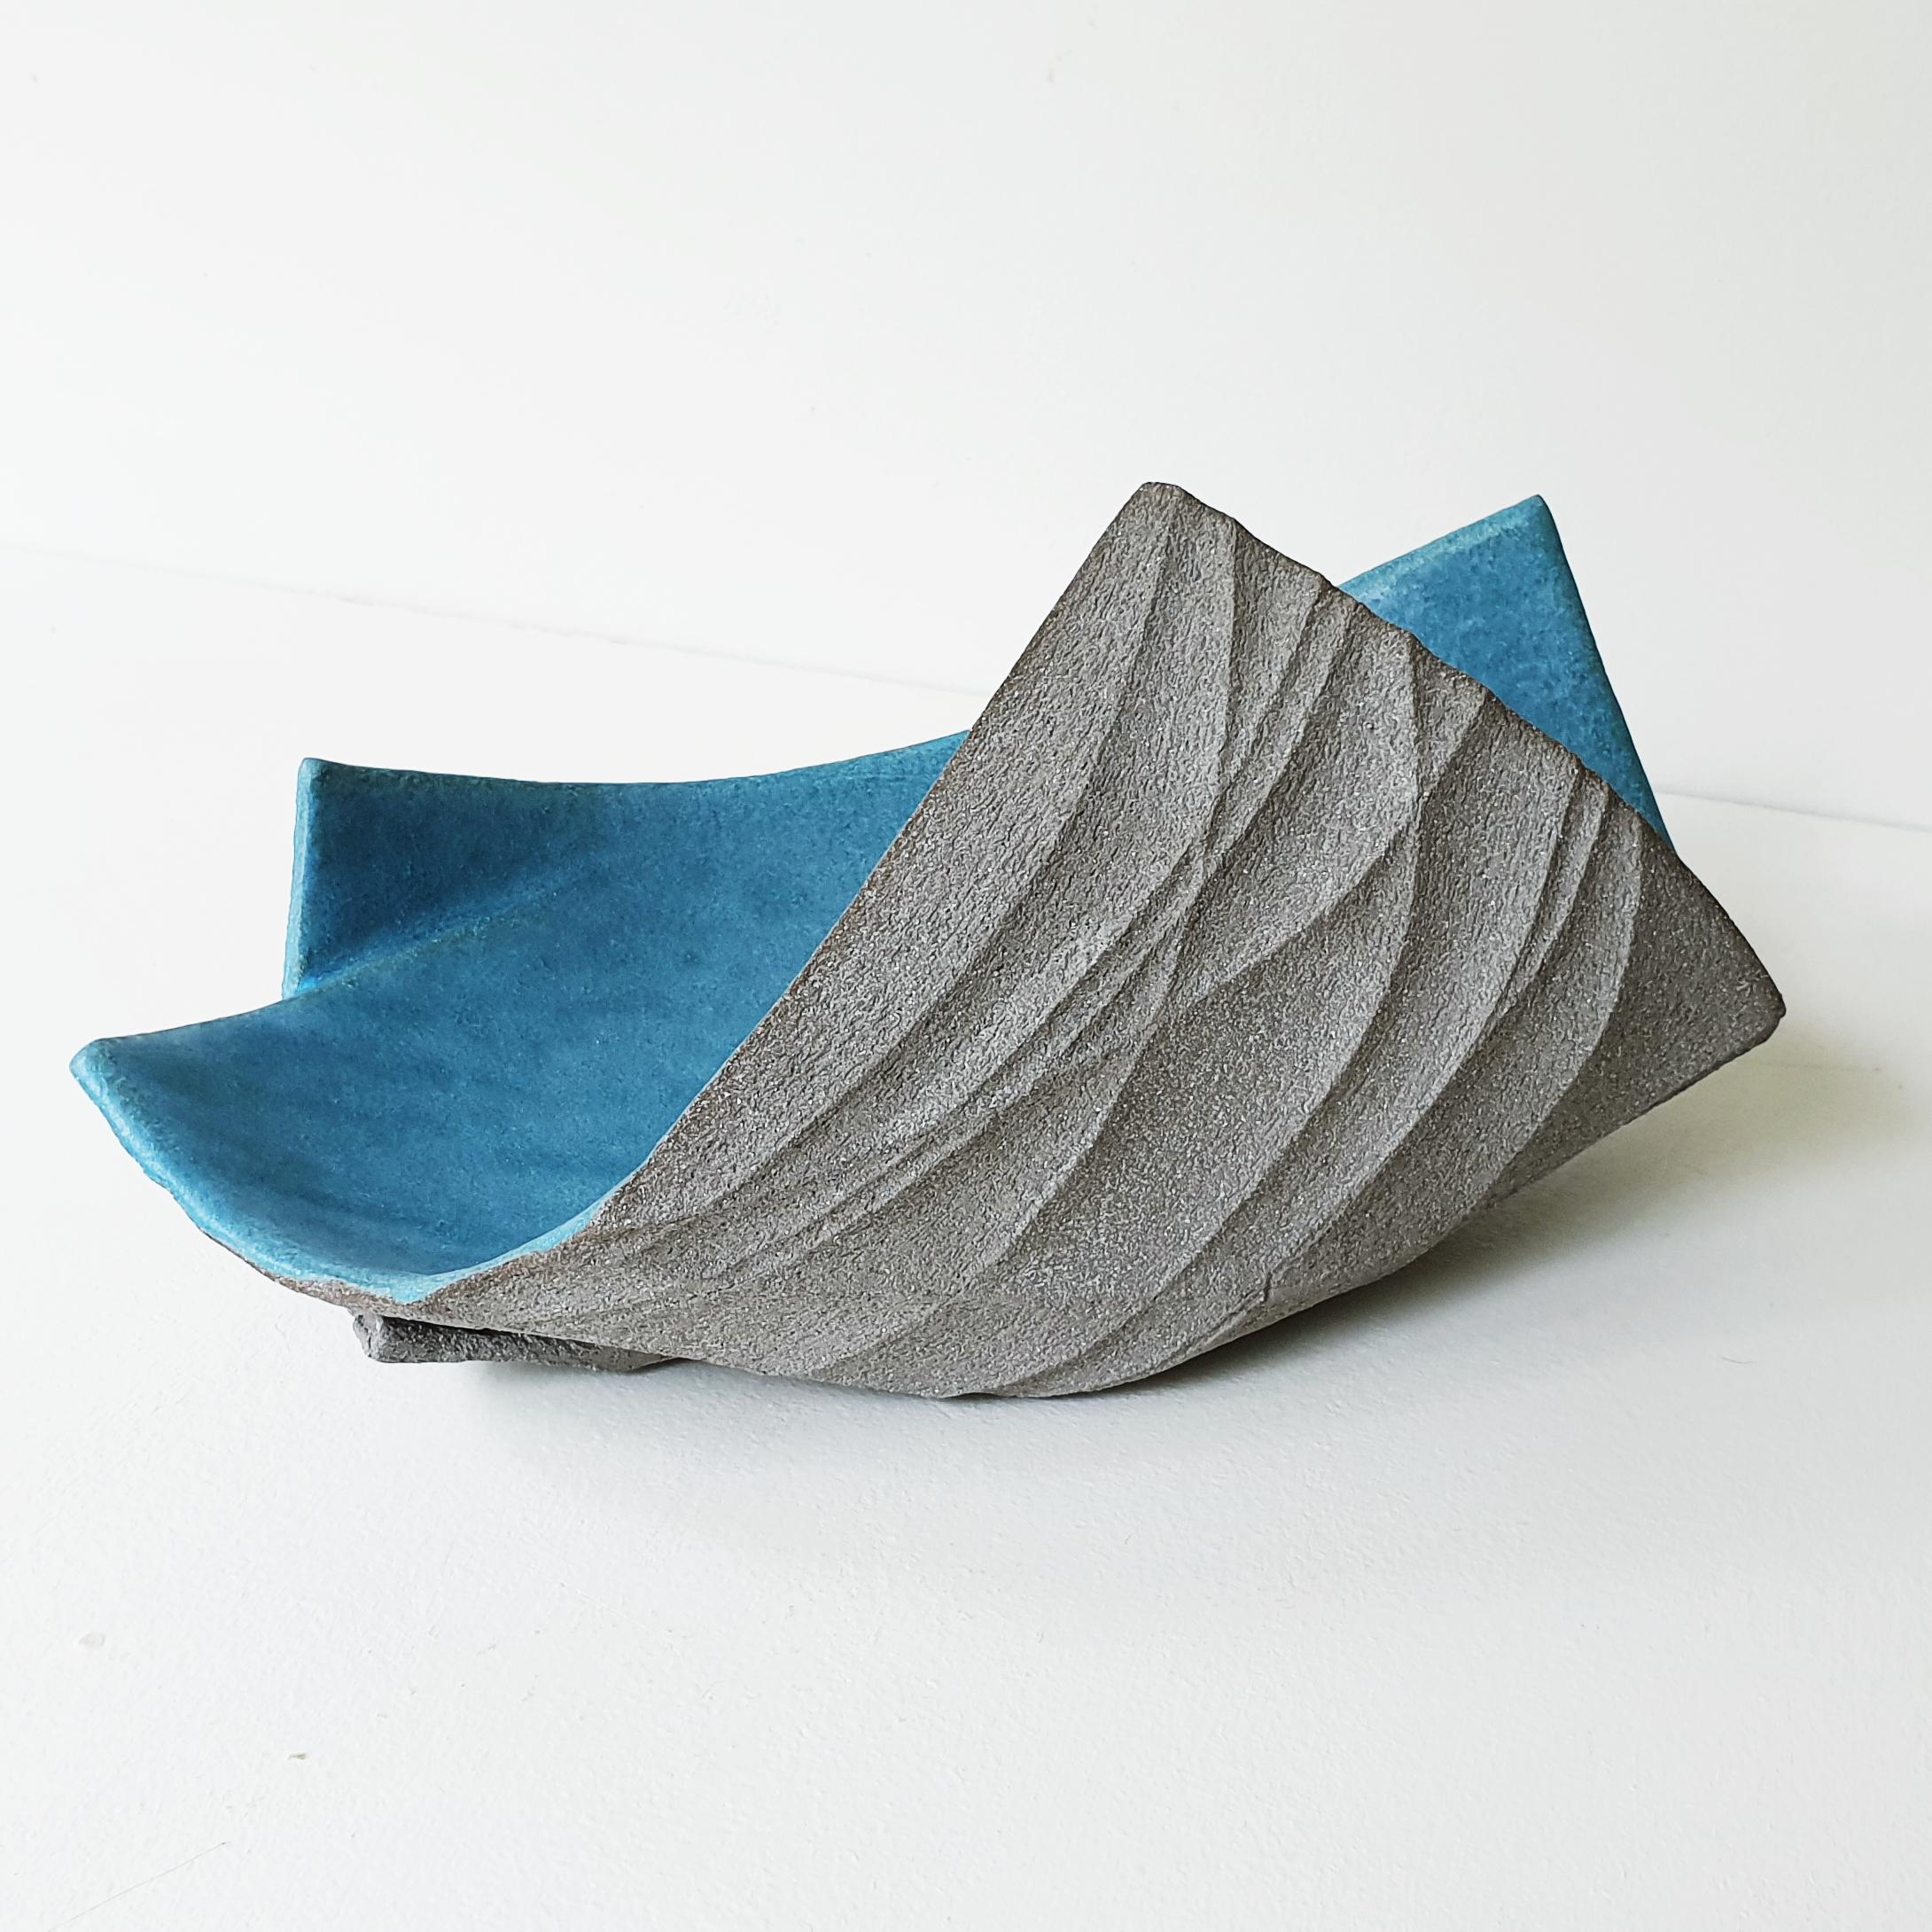 Michele Bianco. Flight vessel (sky blue)